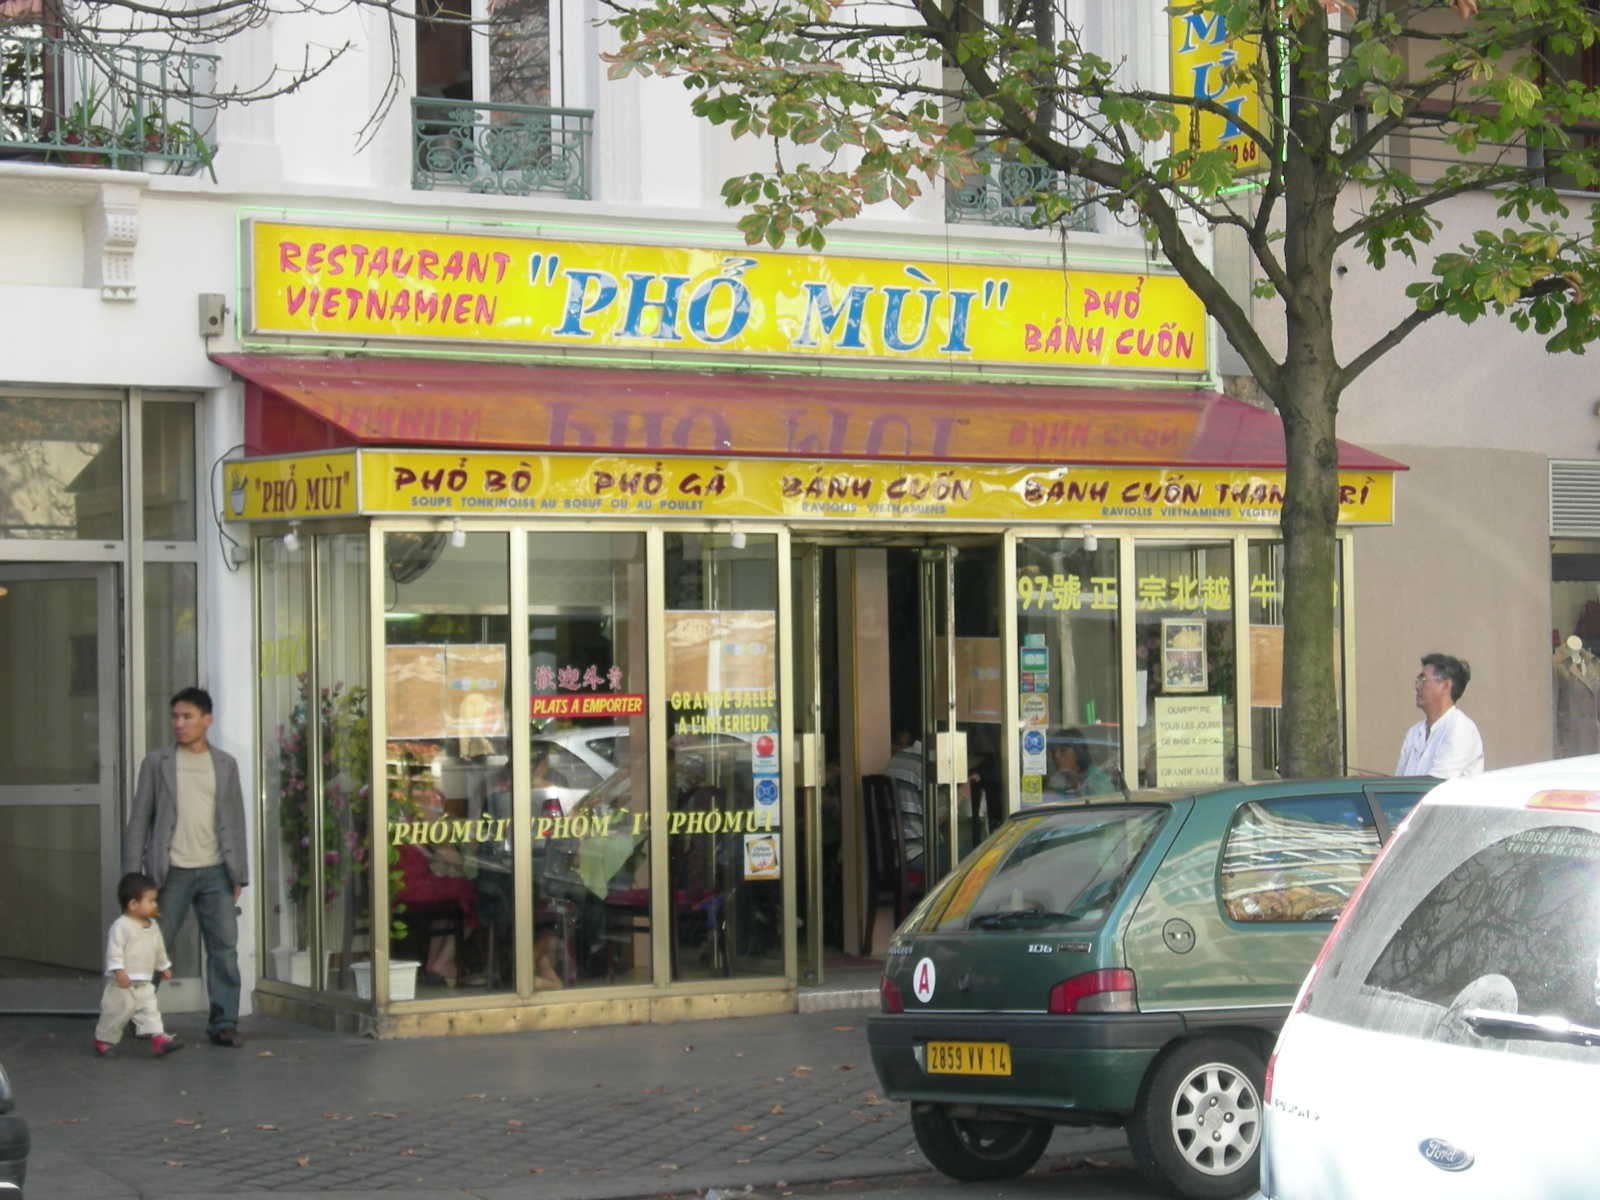 Vietnamese Restaurant On West Kimberly Rd Davenport